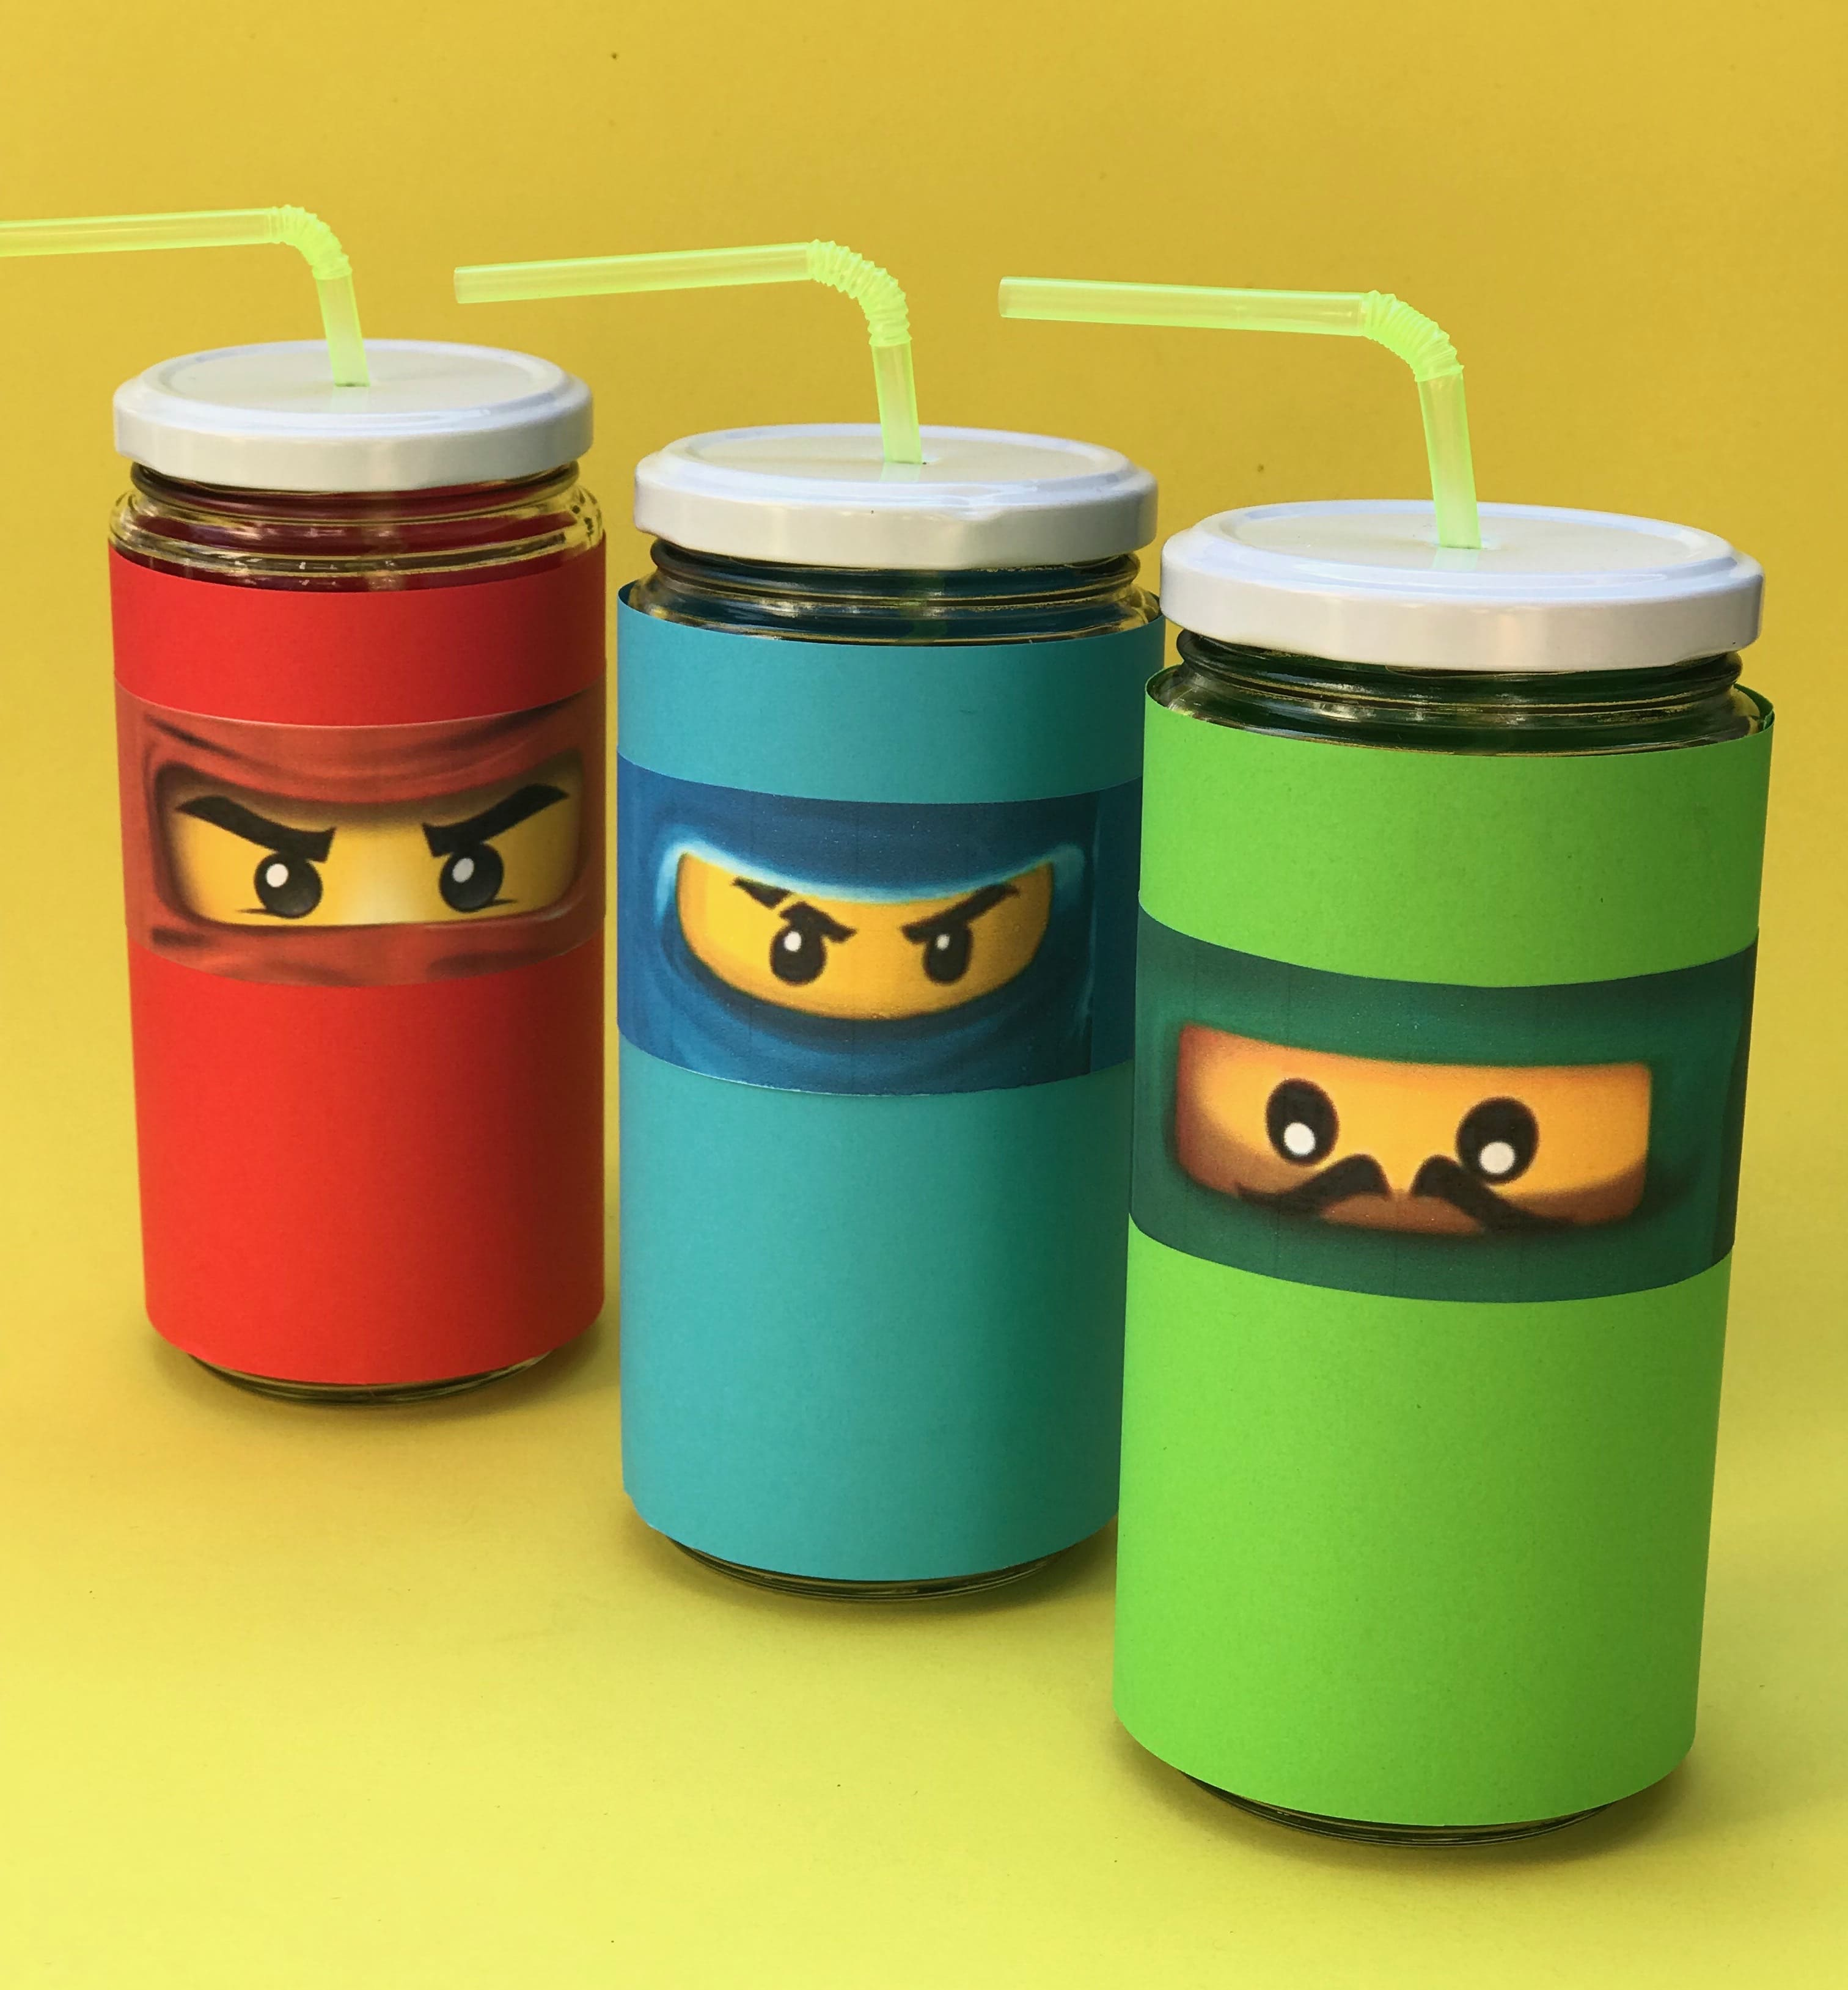 ninjago-kindergeburtstag-upcycling-trinkglaeser-selbermachen-nachhaltige-bastelidee